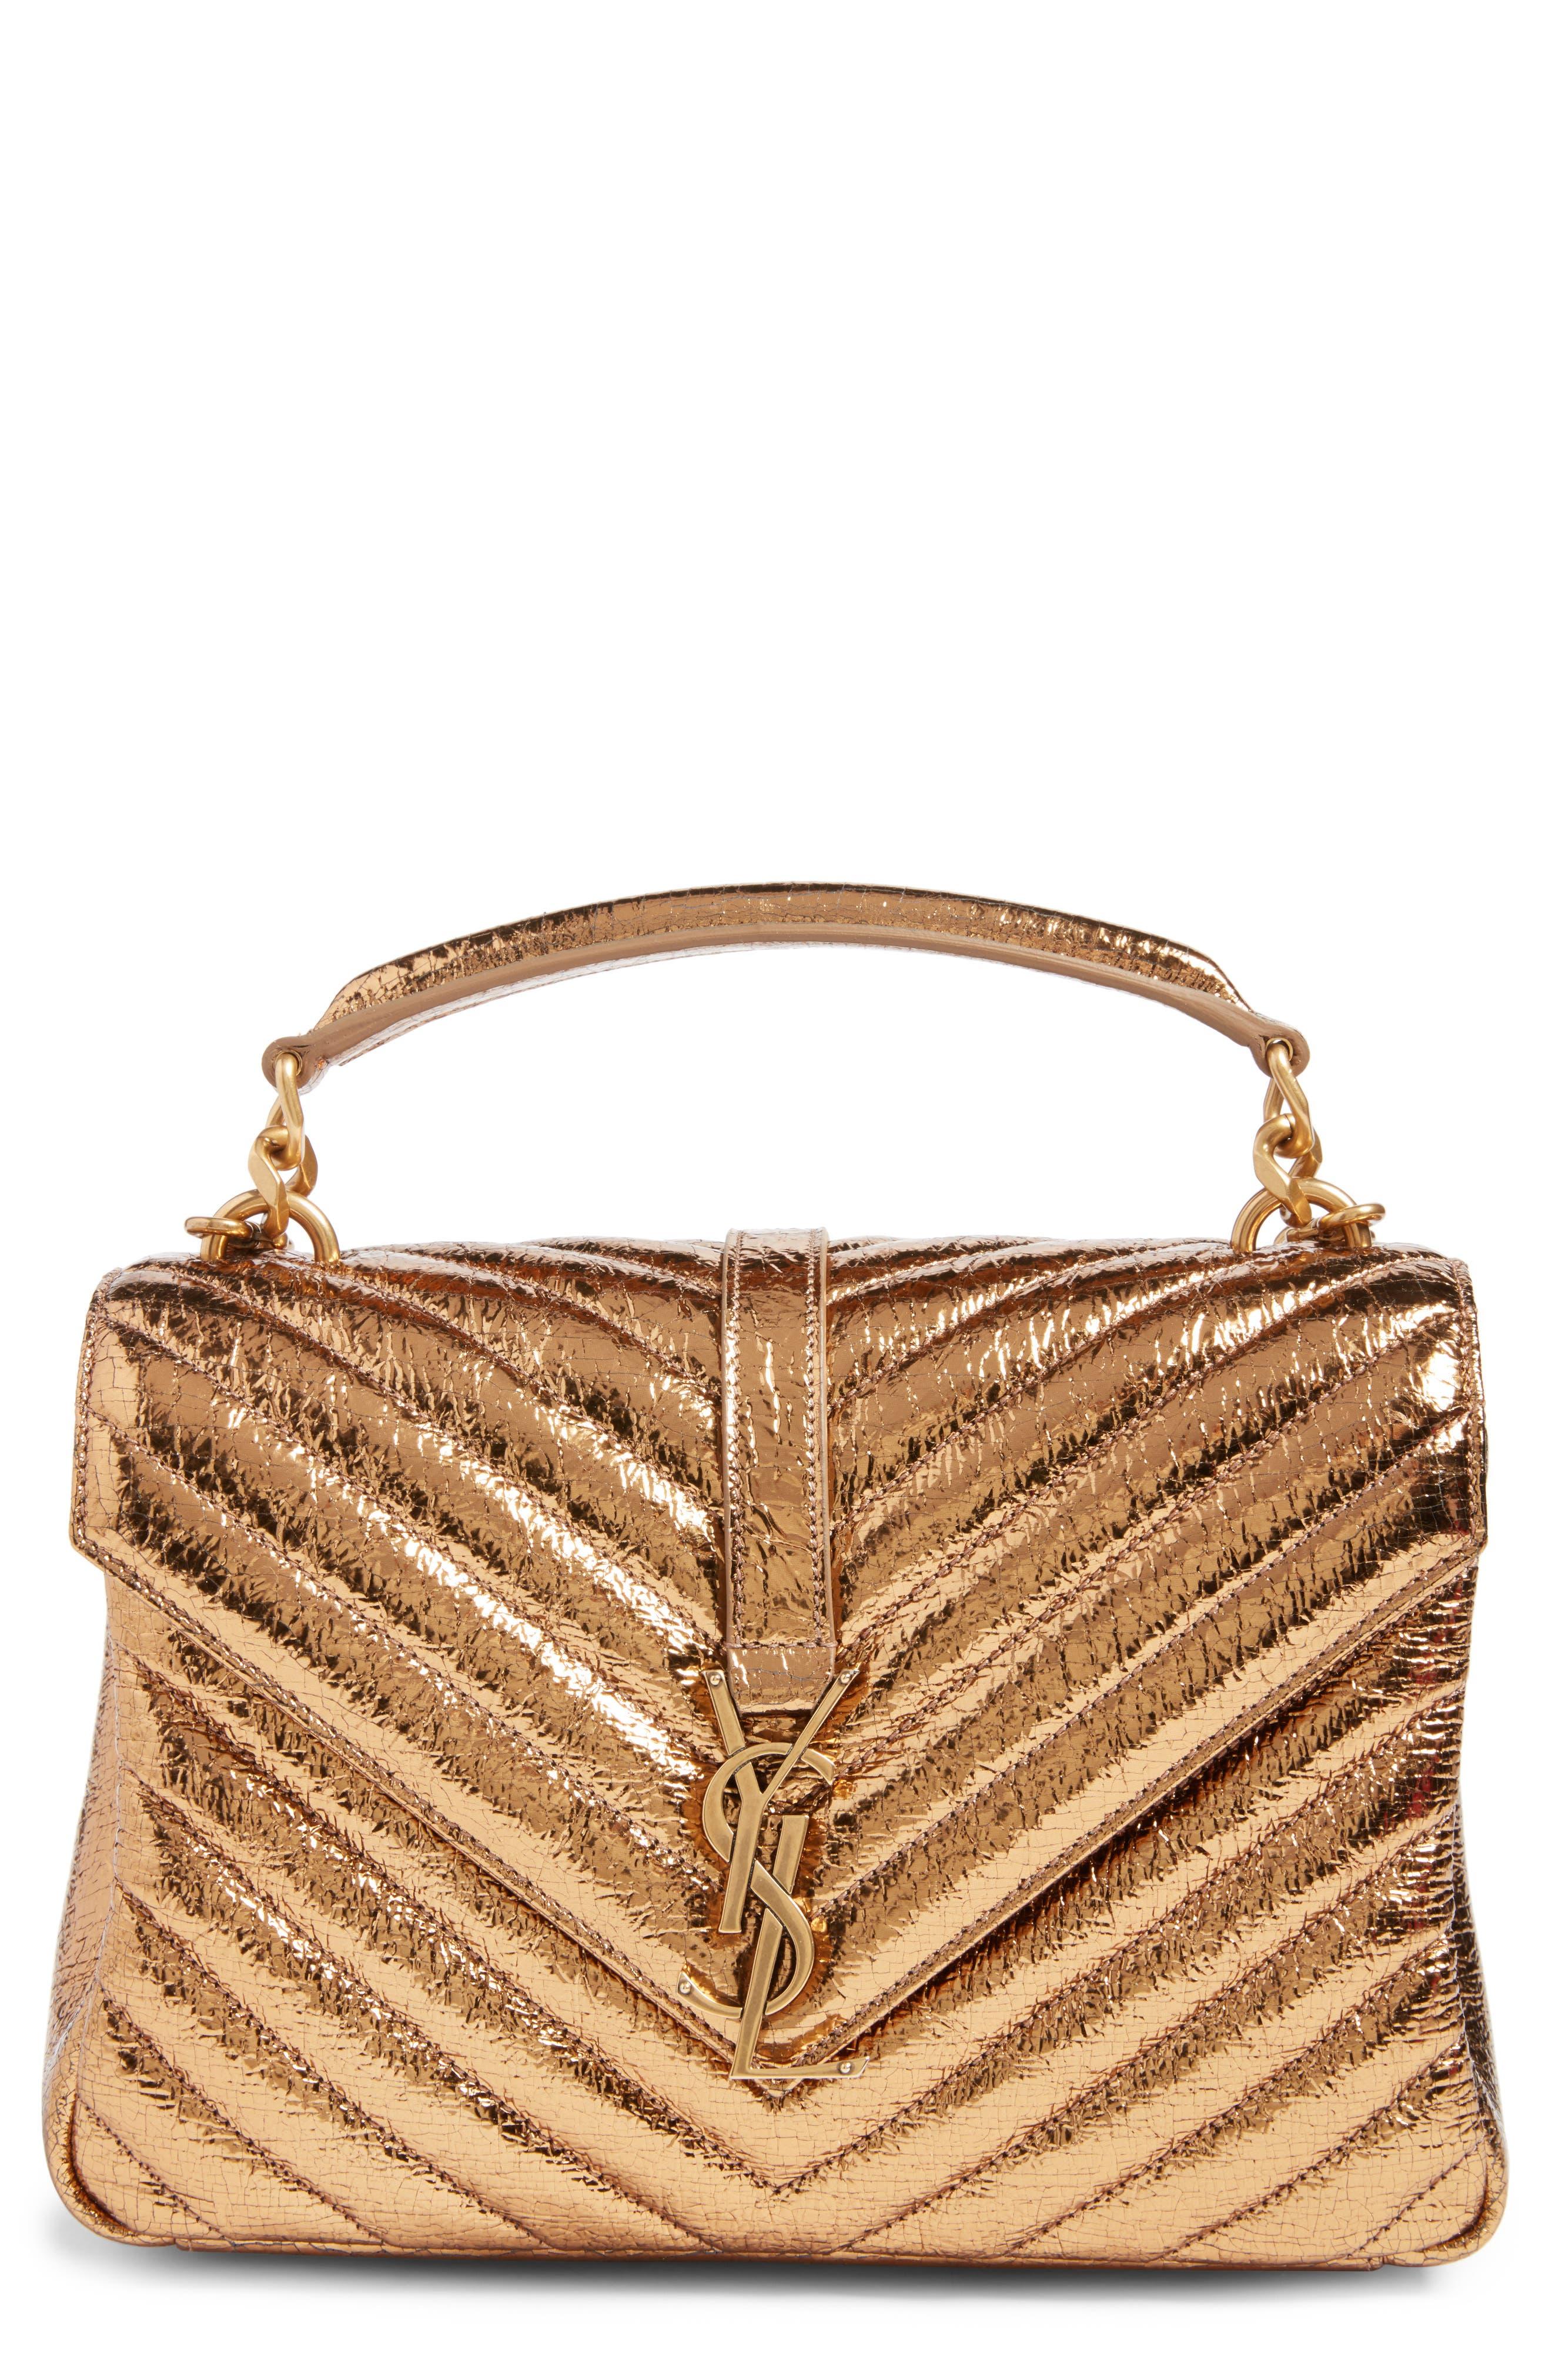 SAINT LAURENT Medium College Crackle Metallic Leather Shoulder Bag